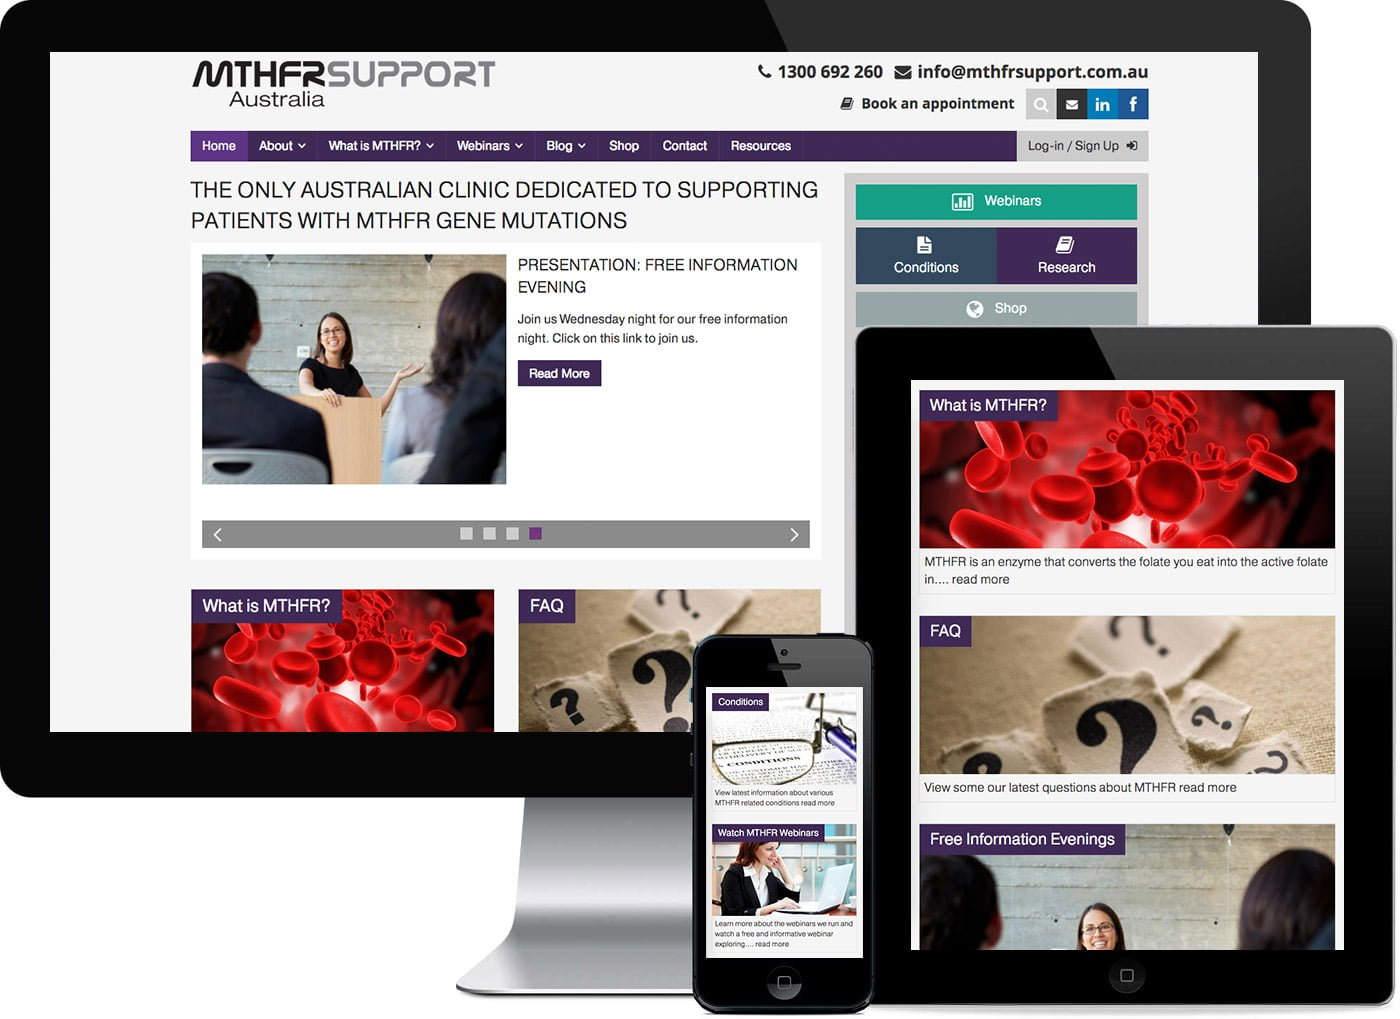 MTHRF-Support